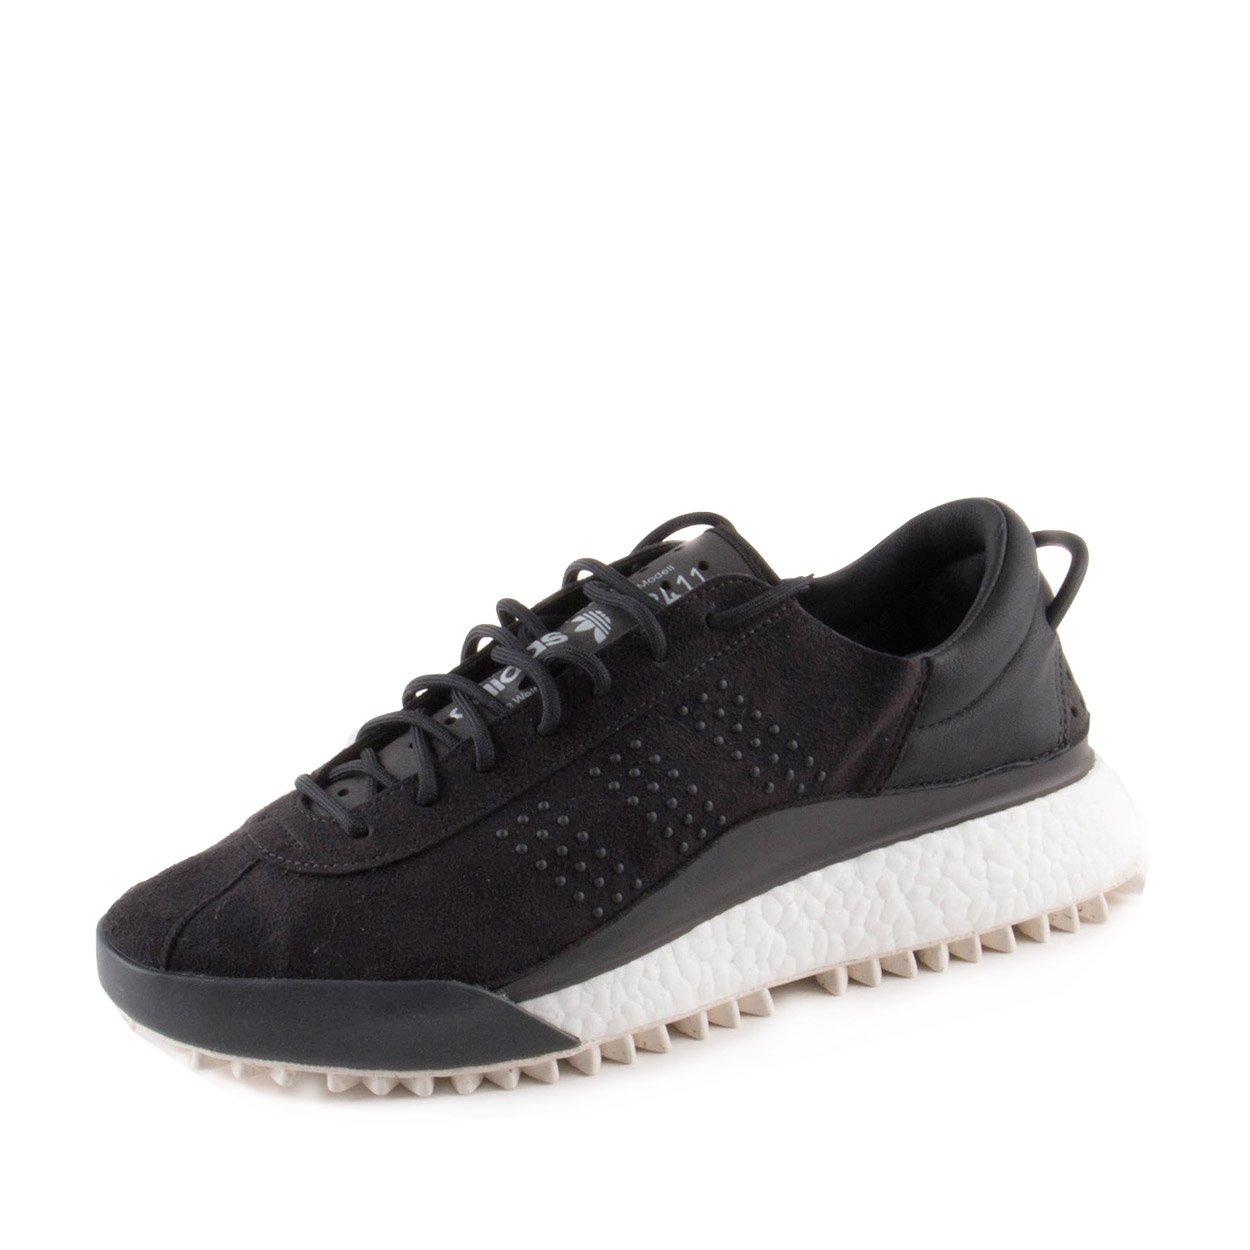 alexander wang scarpe uomo adidas